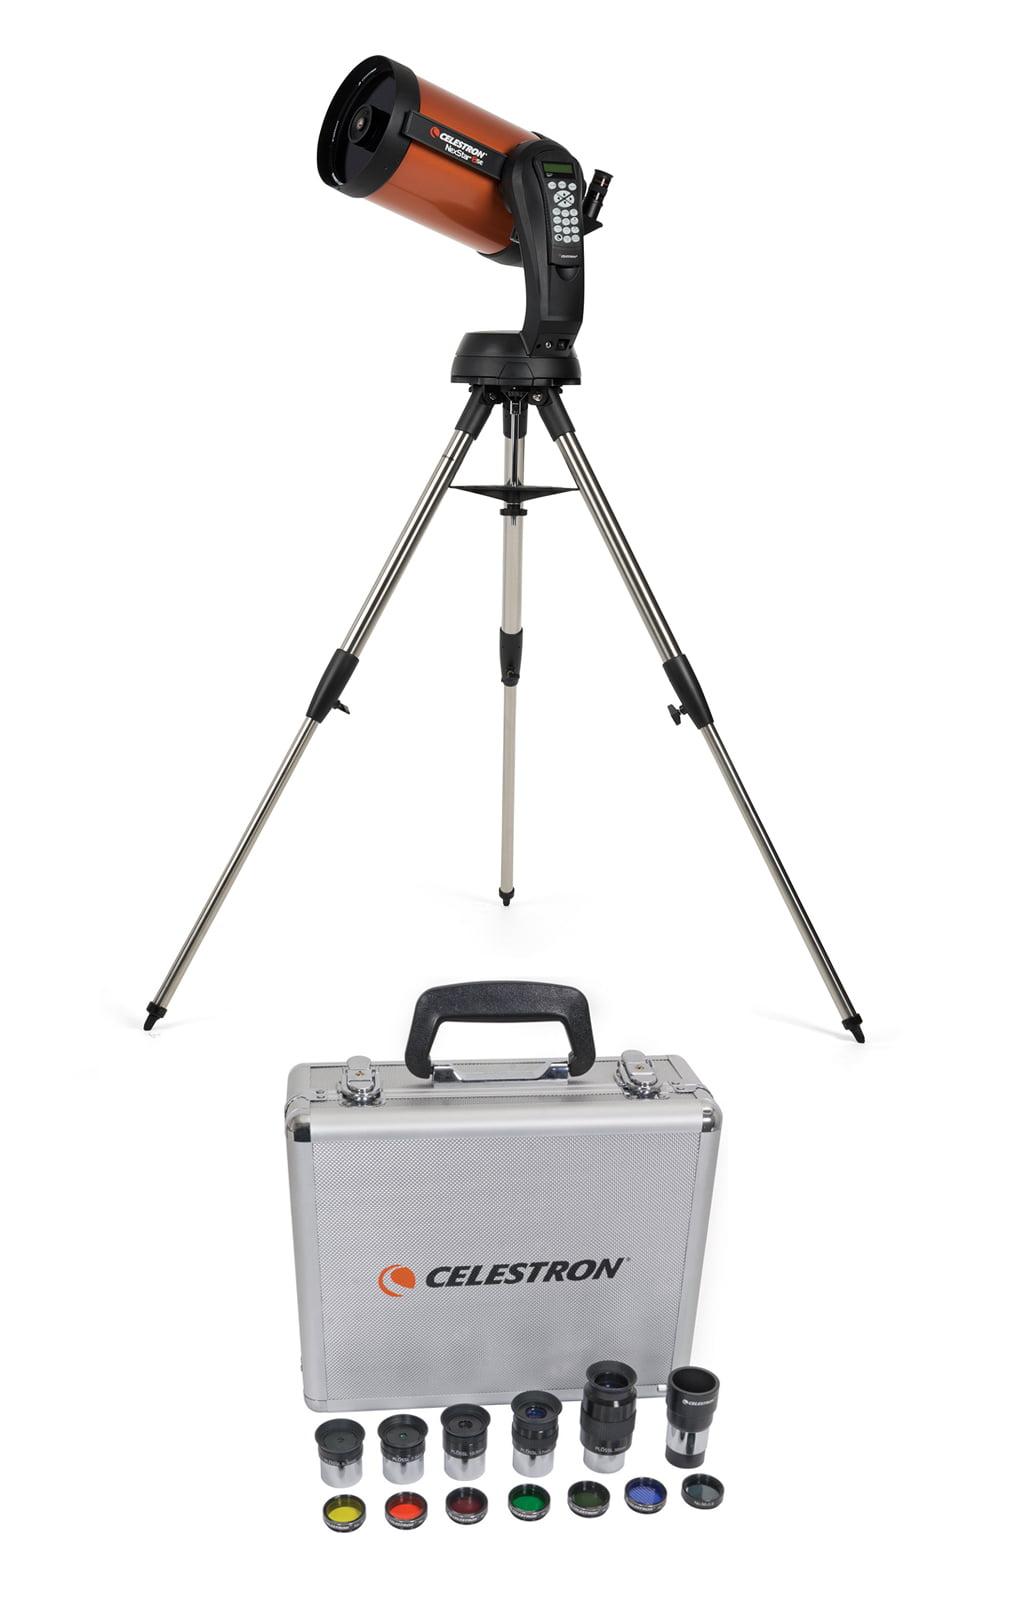 "Celestron Nexstar 6SE Computerized Telescope + Eyepiece Filter Kit (1.25"") by Celestron International"